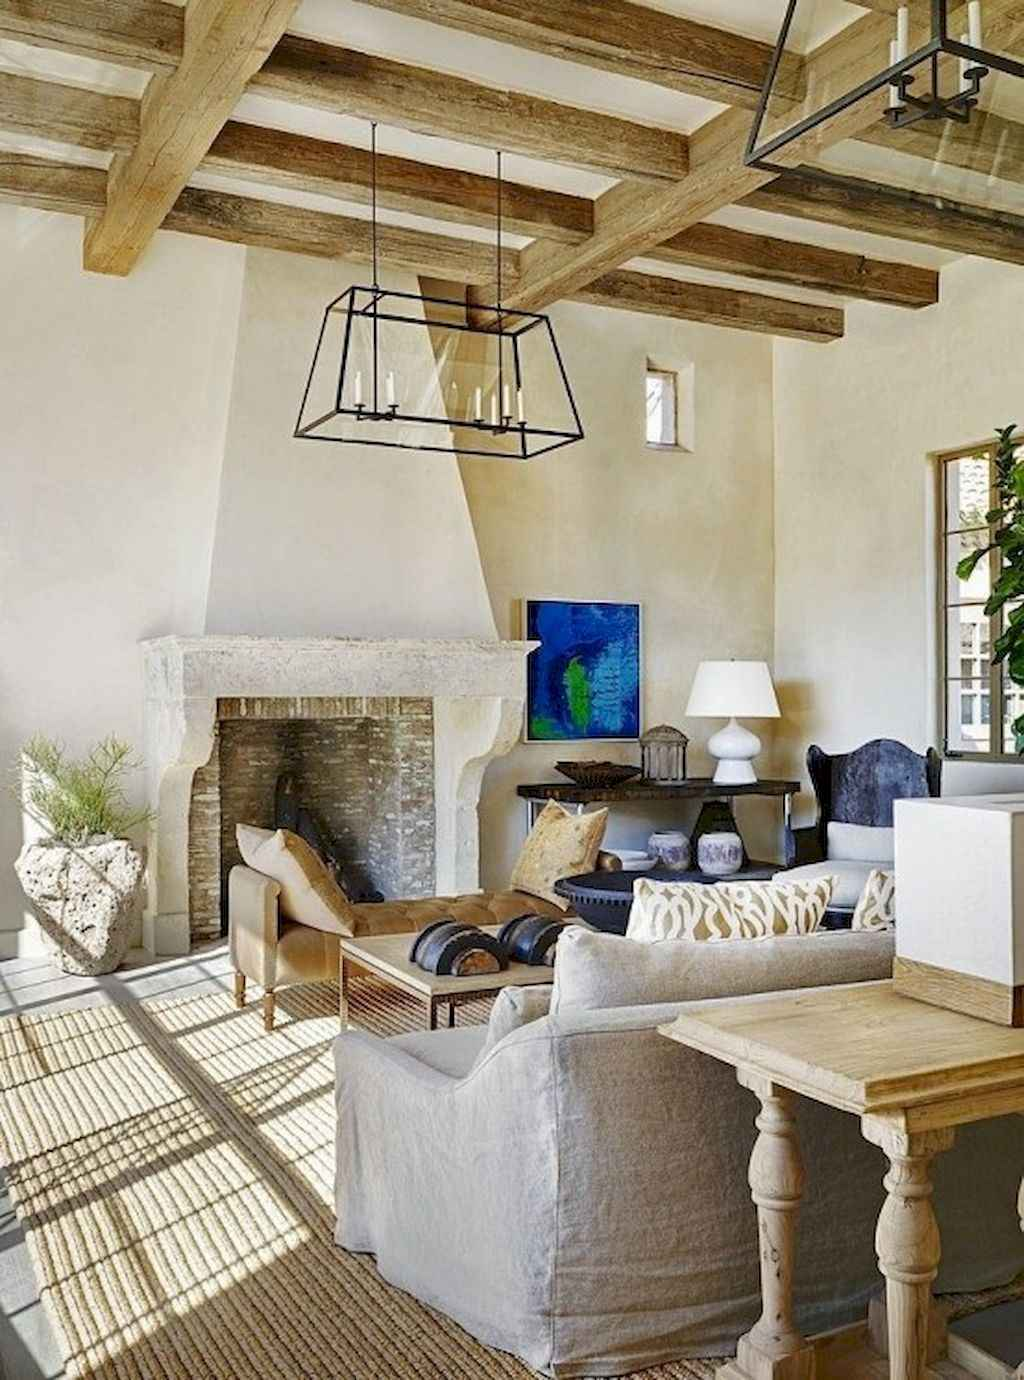 70 Rustic Farmhouse Living Room Decor Ideas (28)